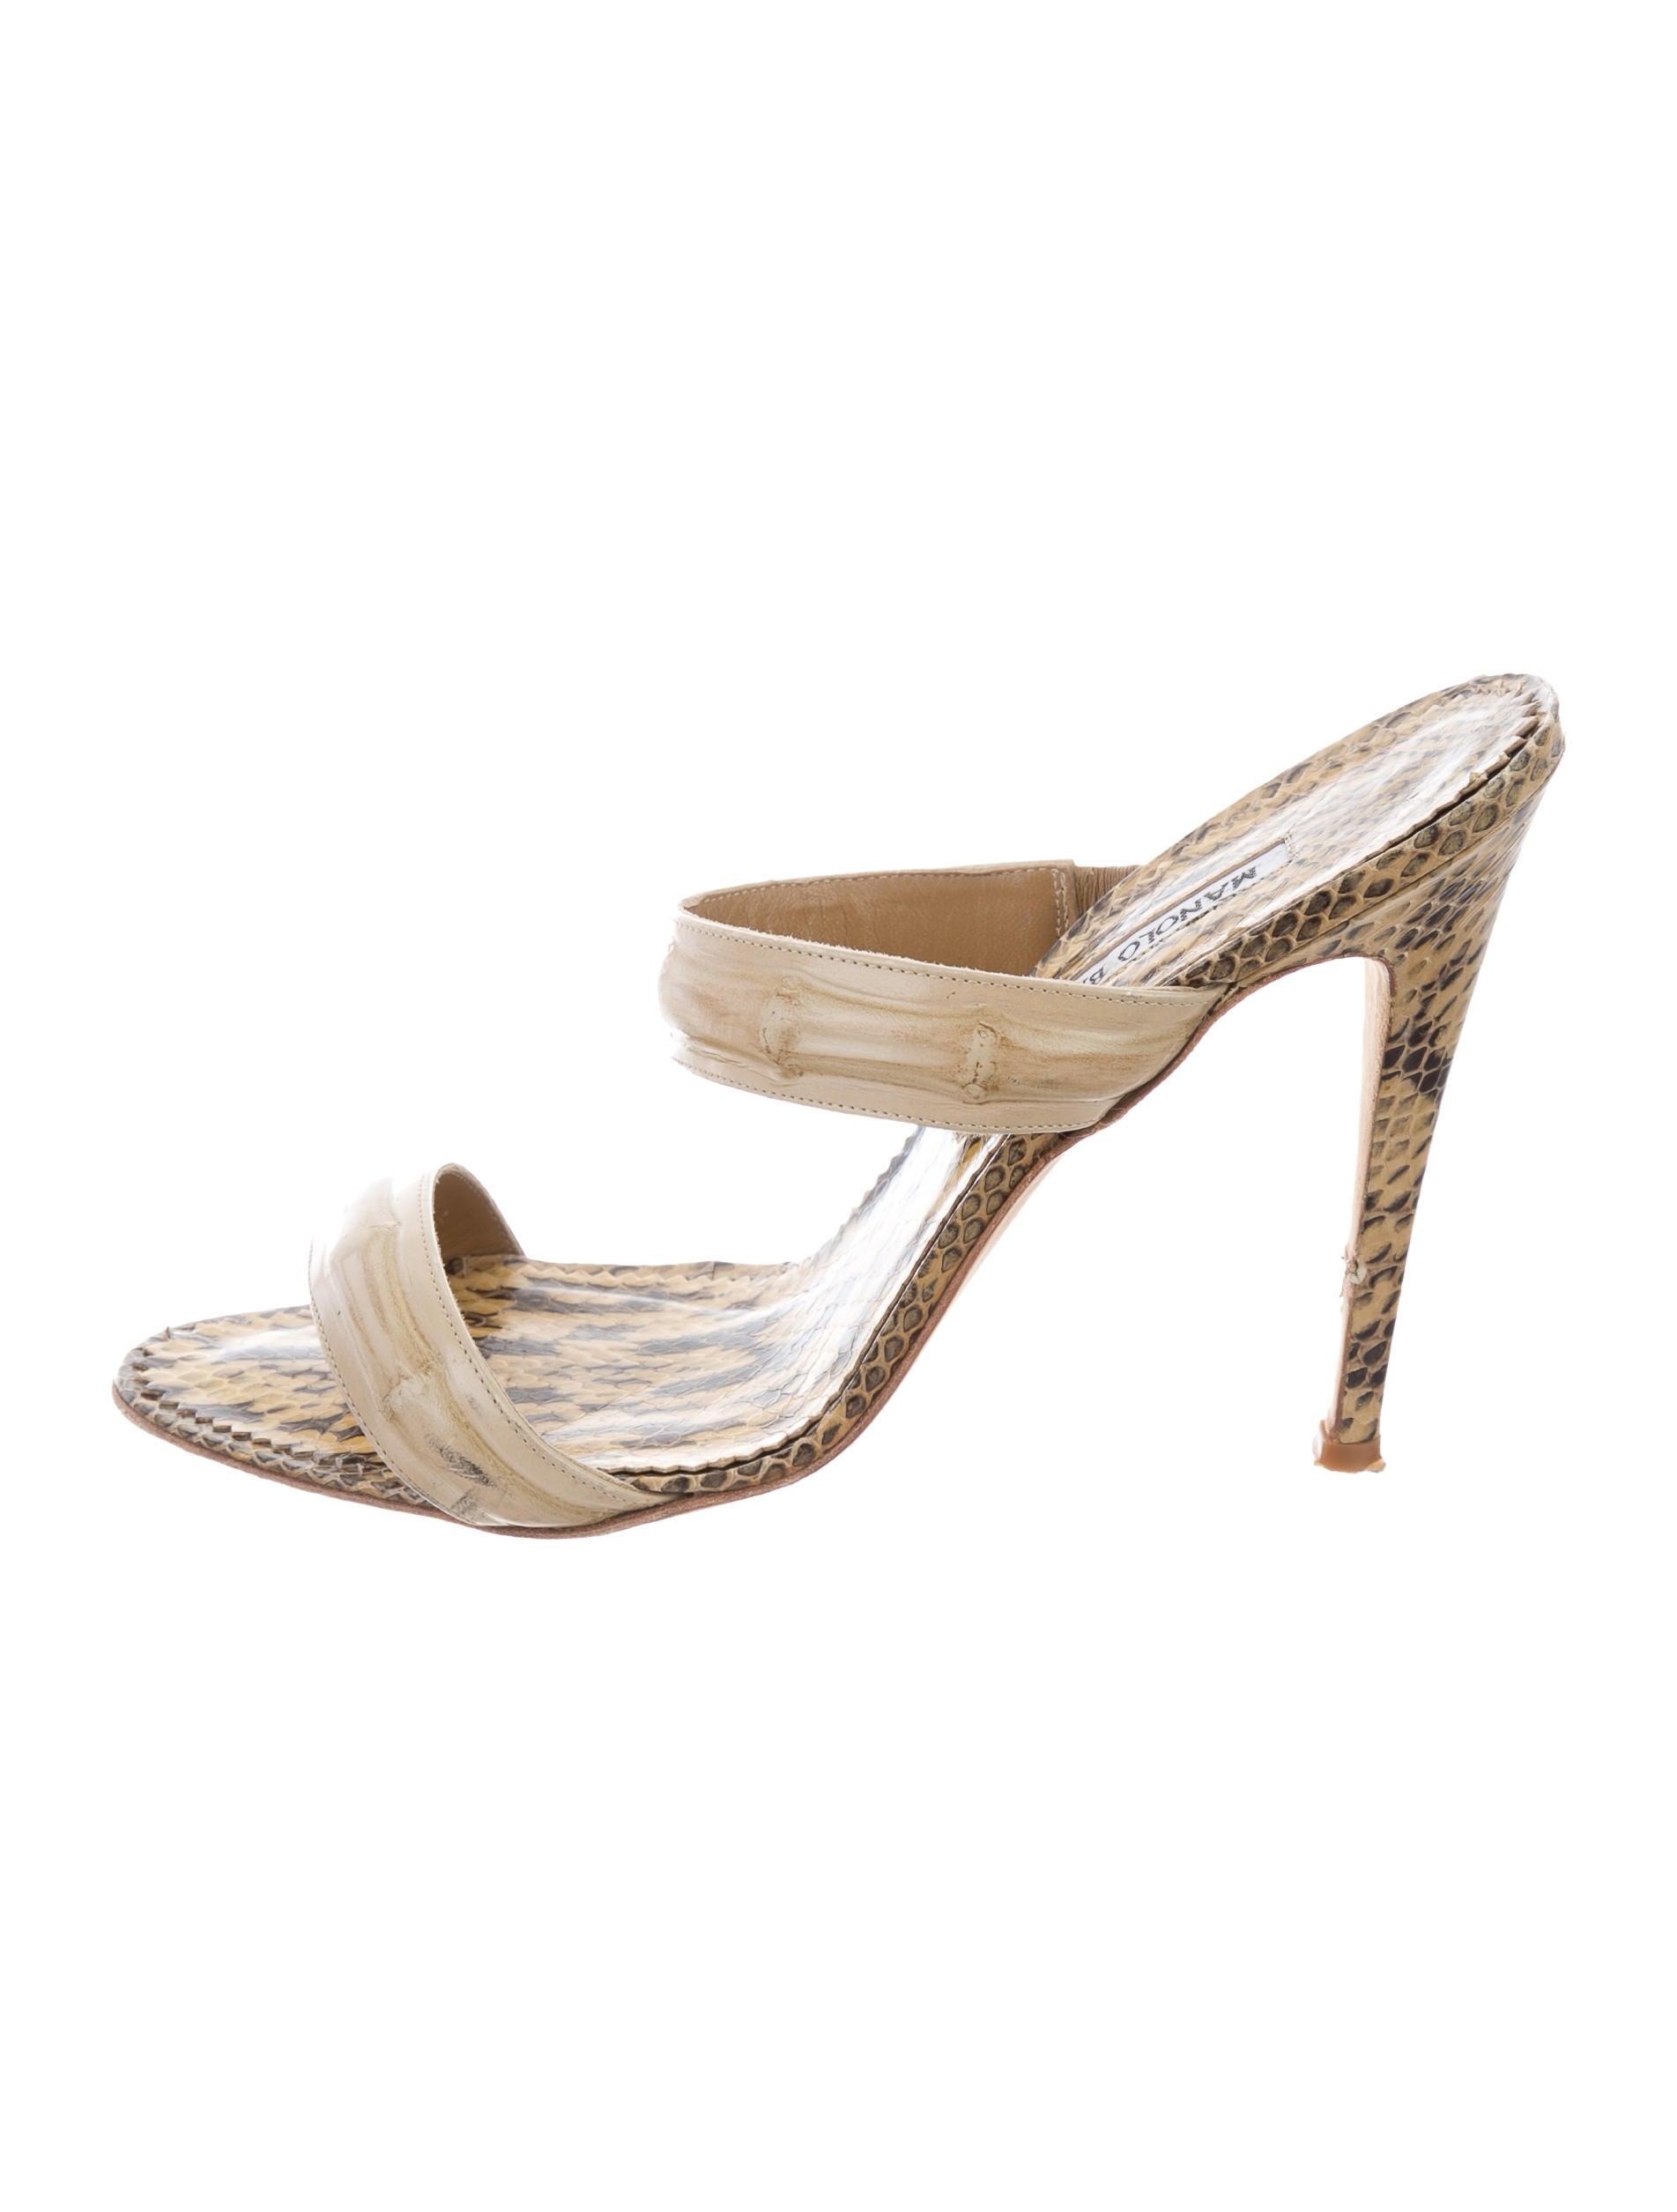 100% authentic outlet footaction Manolo Blahnik Snakeskin-Trimmed Slide Sandals online sale Zjq3SZ